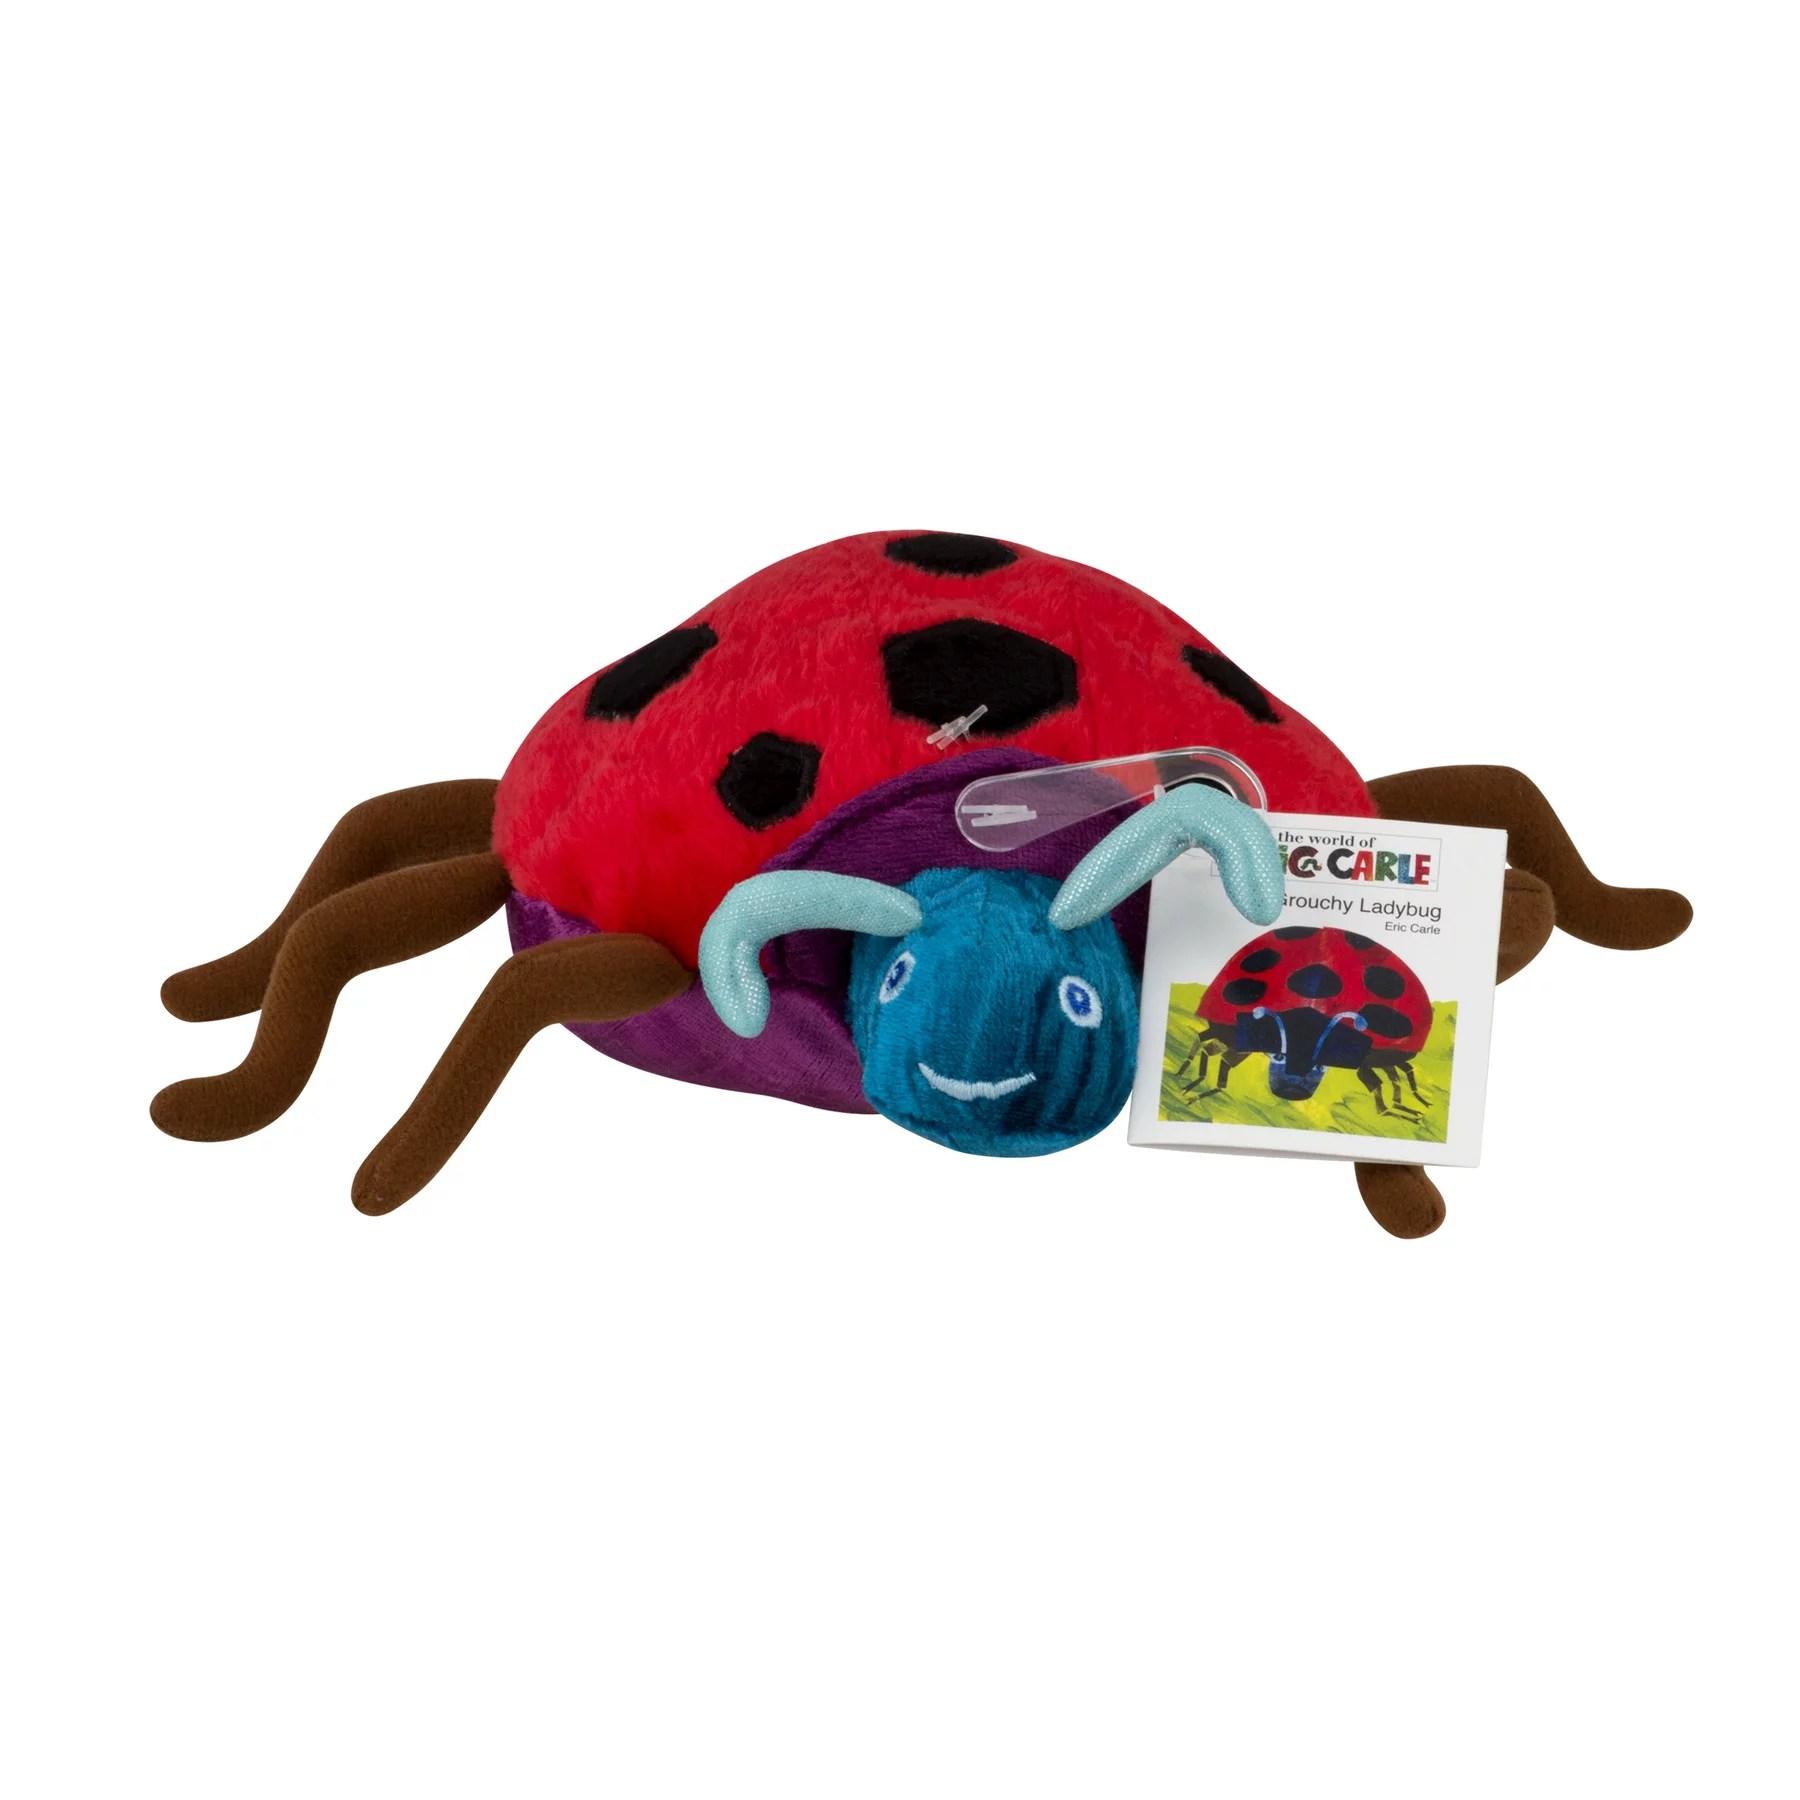 The World Of Eric Carle The Grouchy Ladybug Beanbag Plush